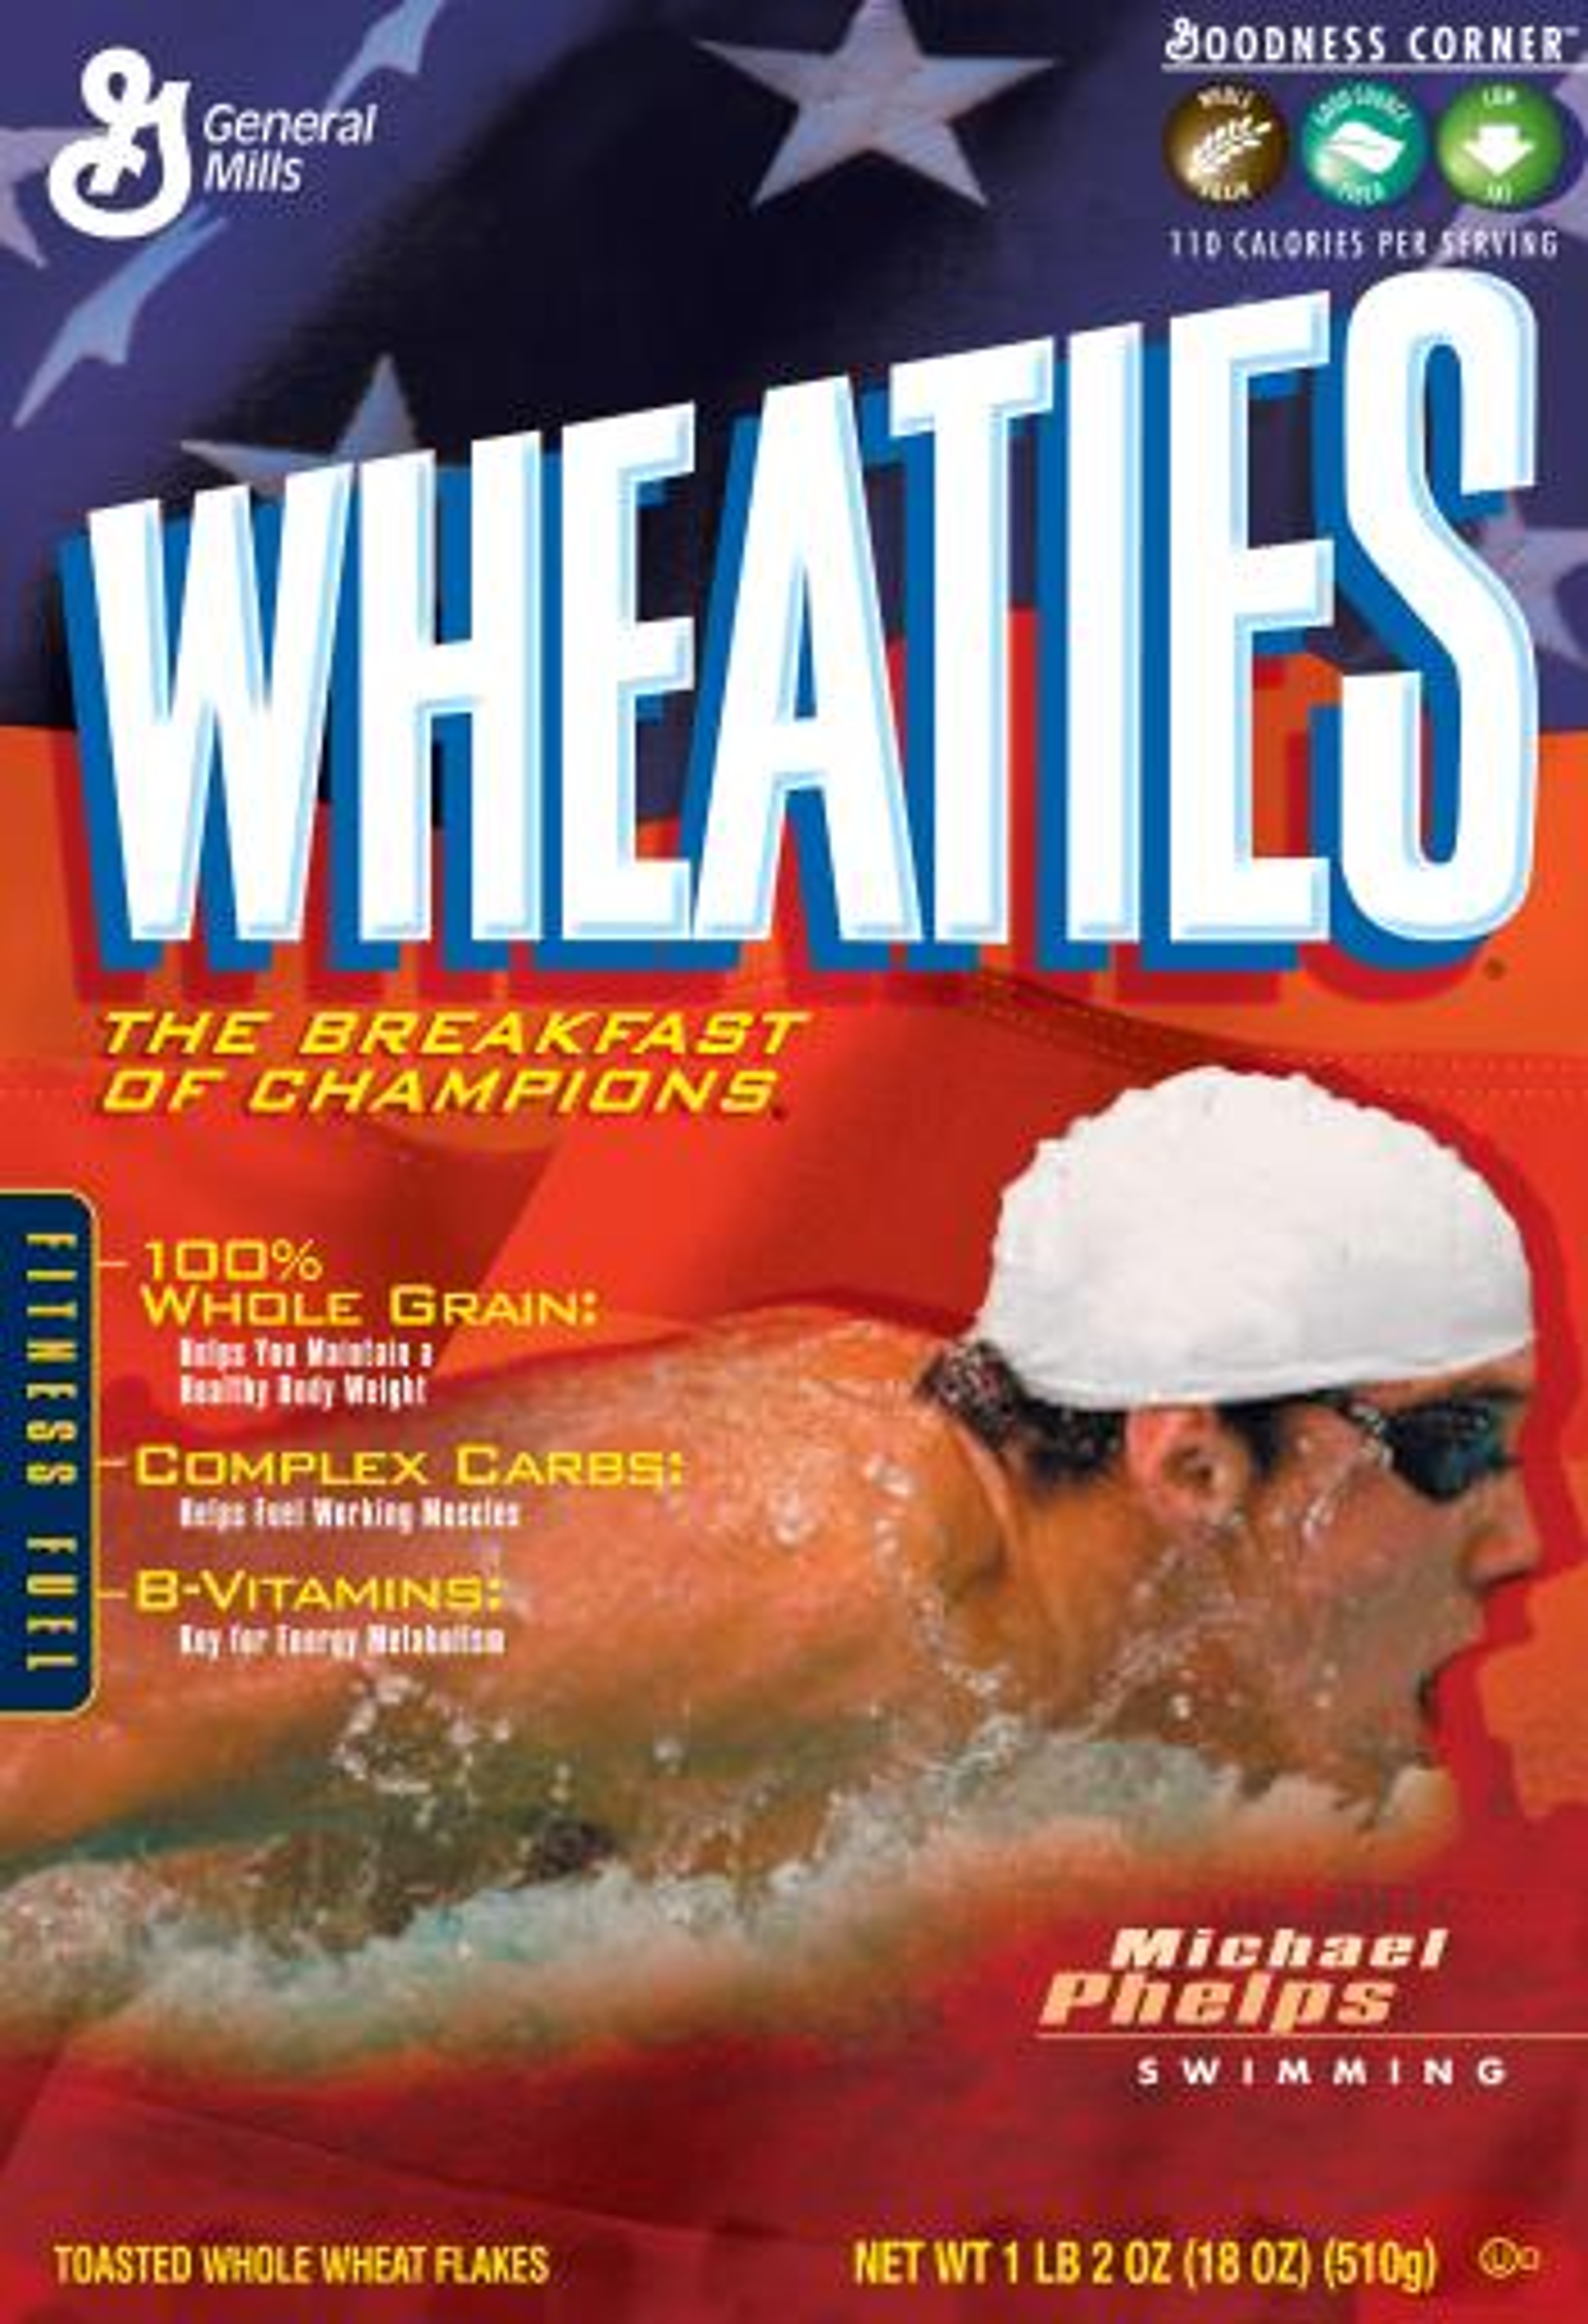 Michael Phelps on the Wheaties box.